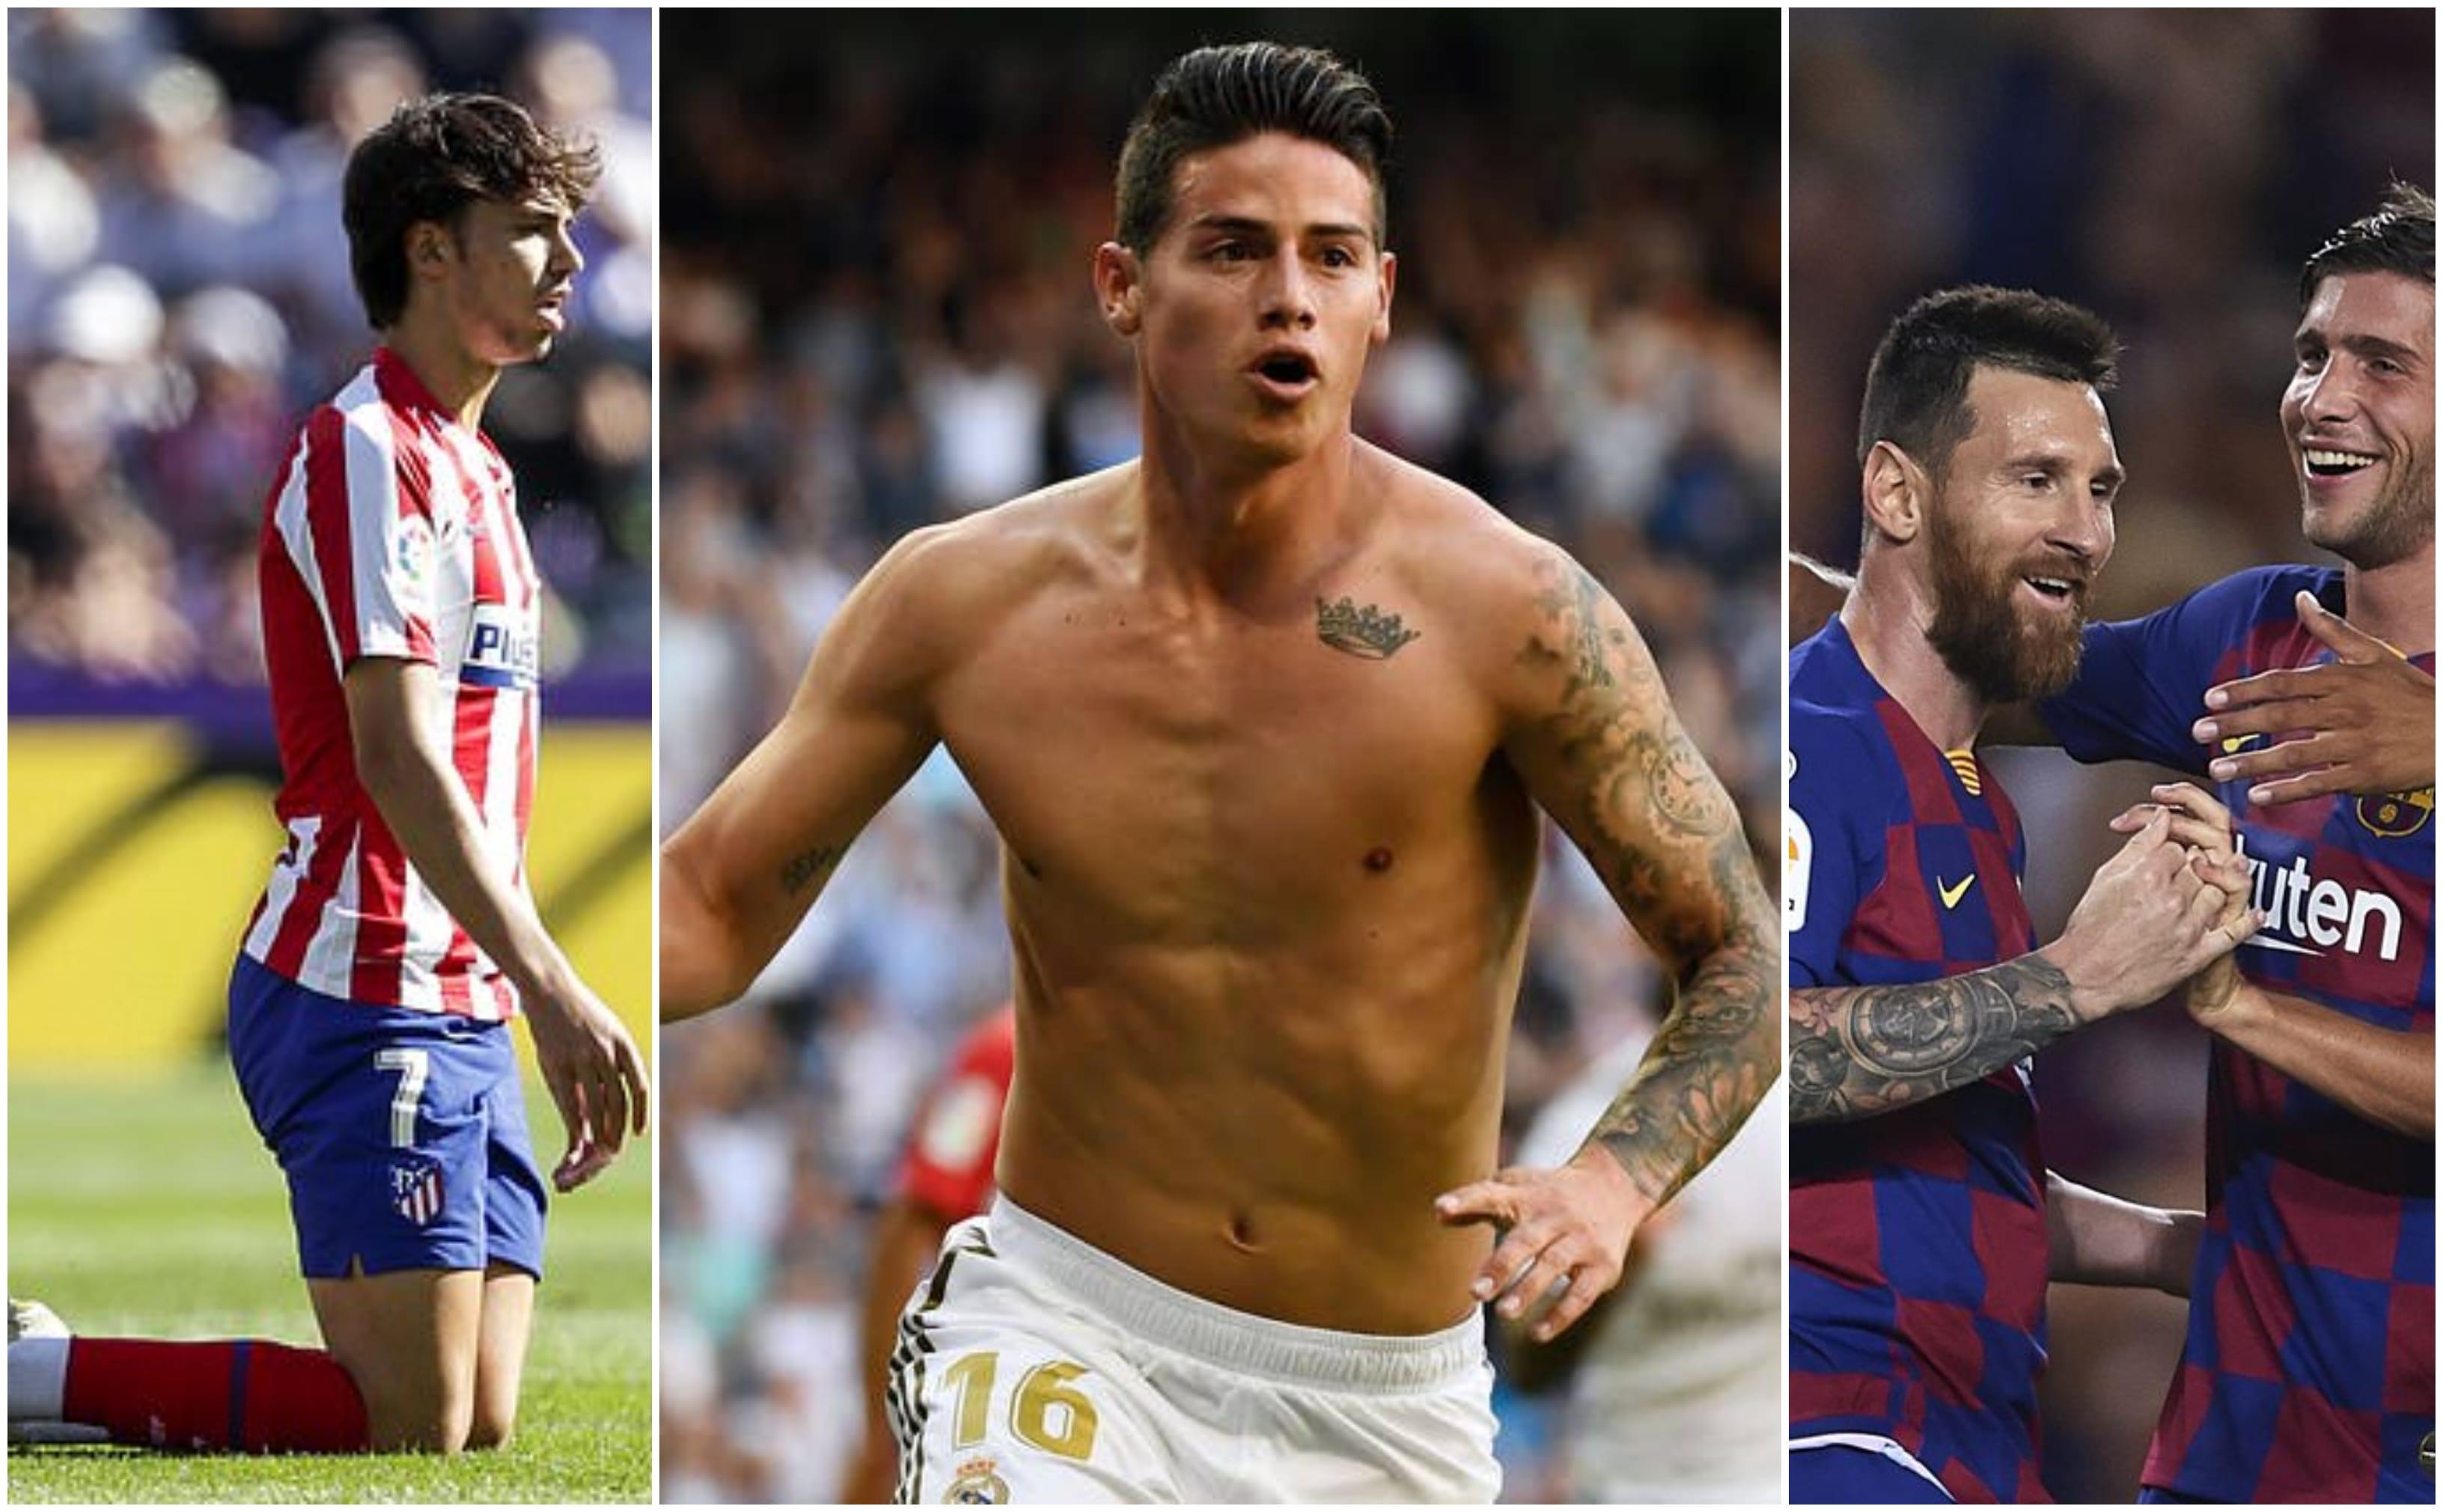 La Liga 2019/20 Matchday 8 Round Up